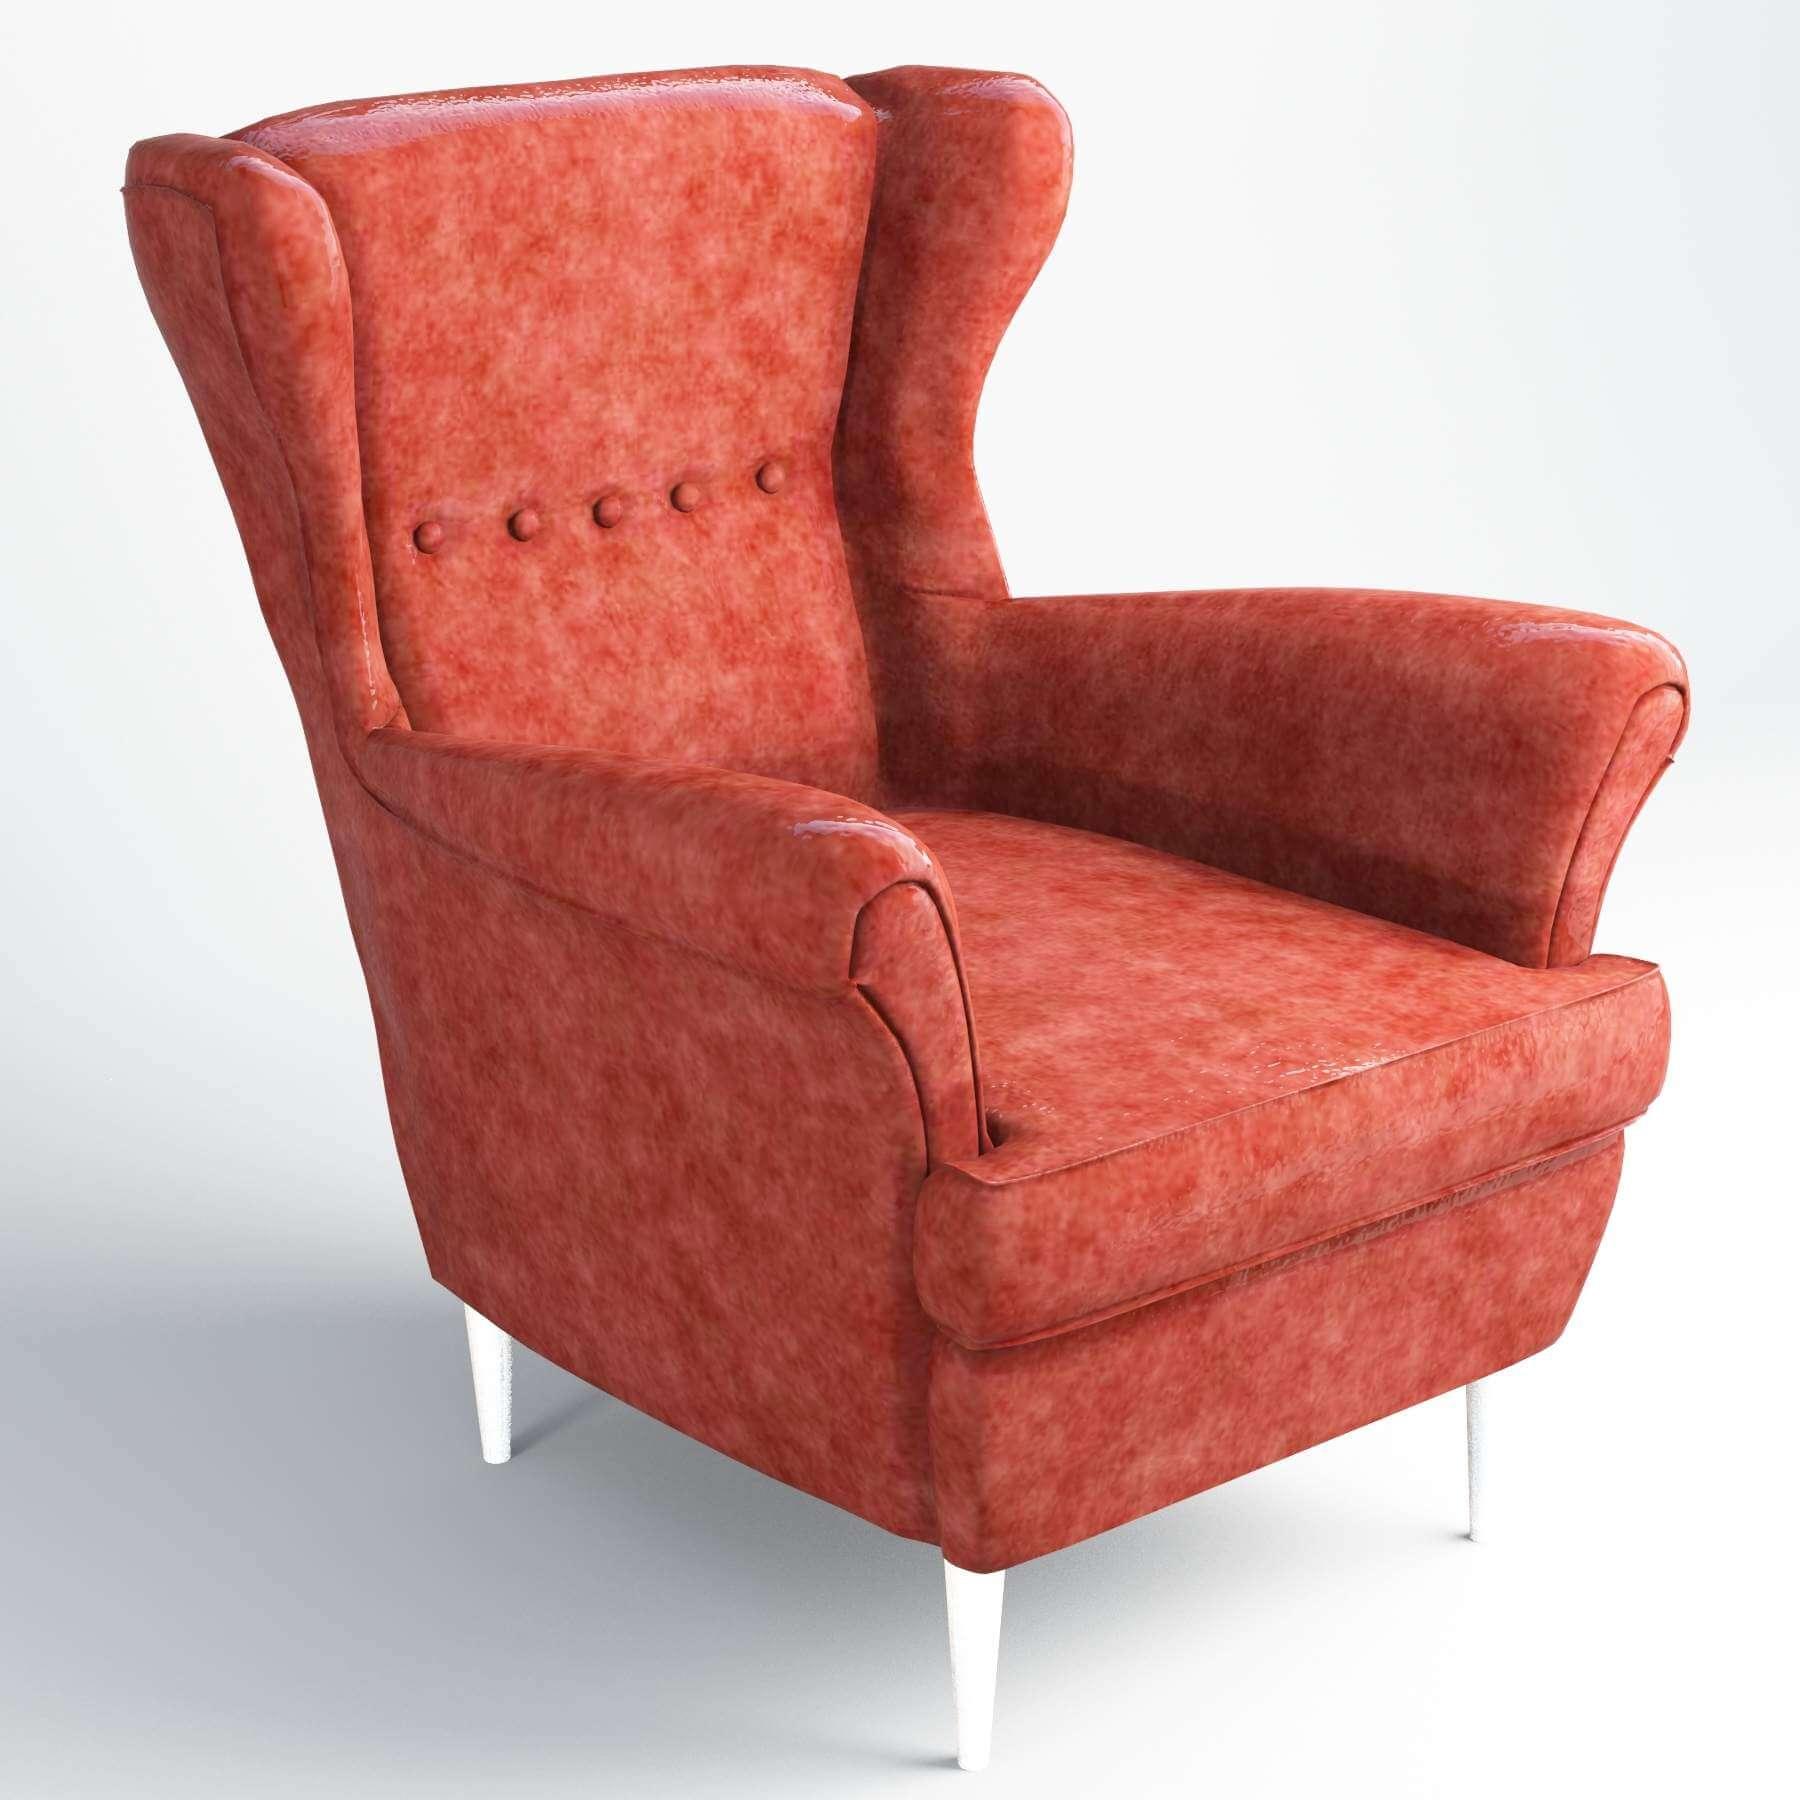 Ikea Strandmon Sofa 3D Model